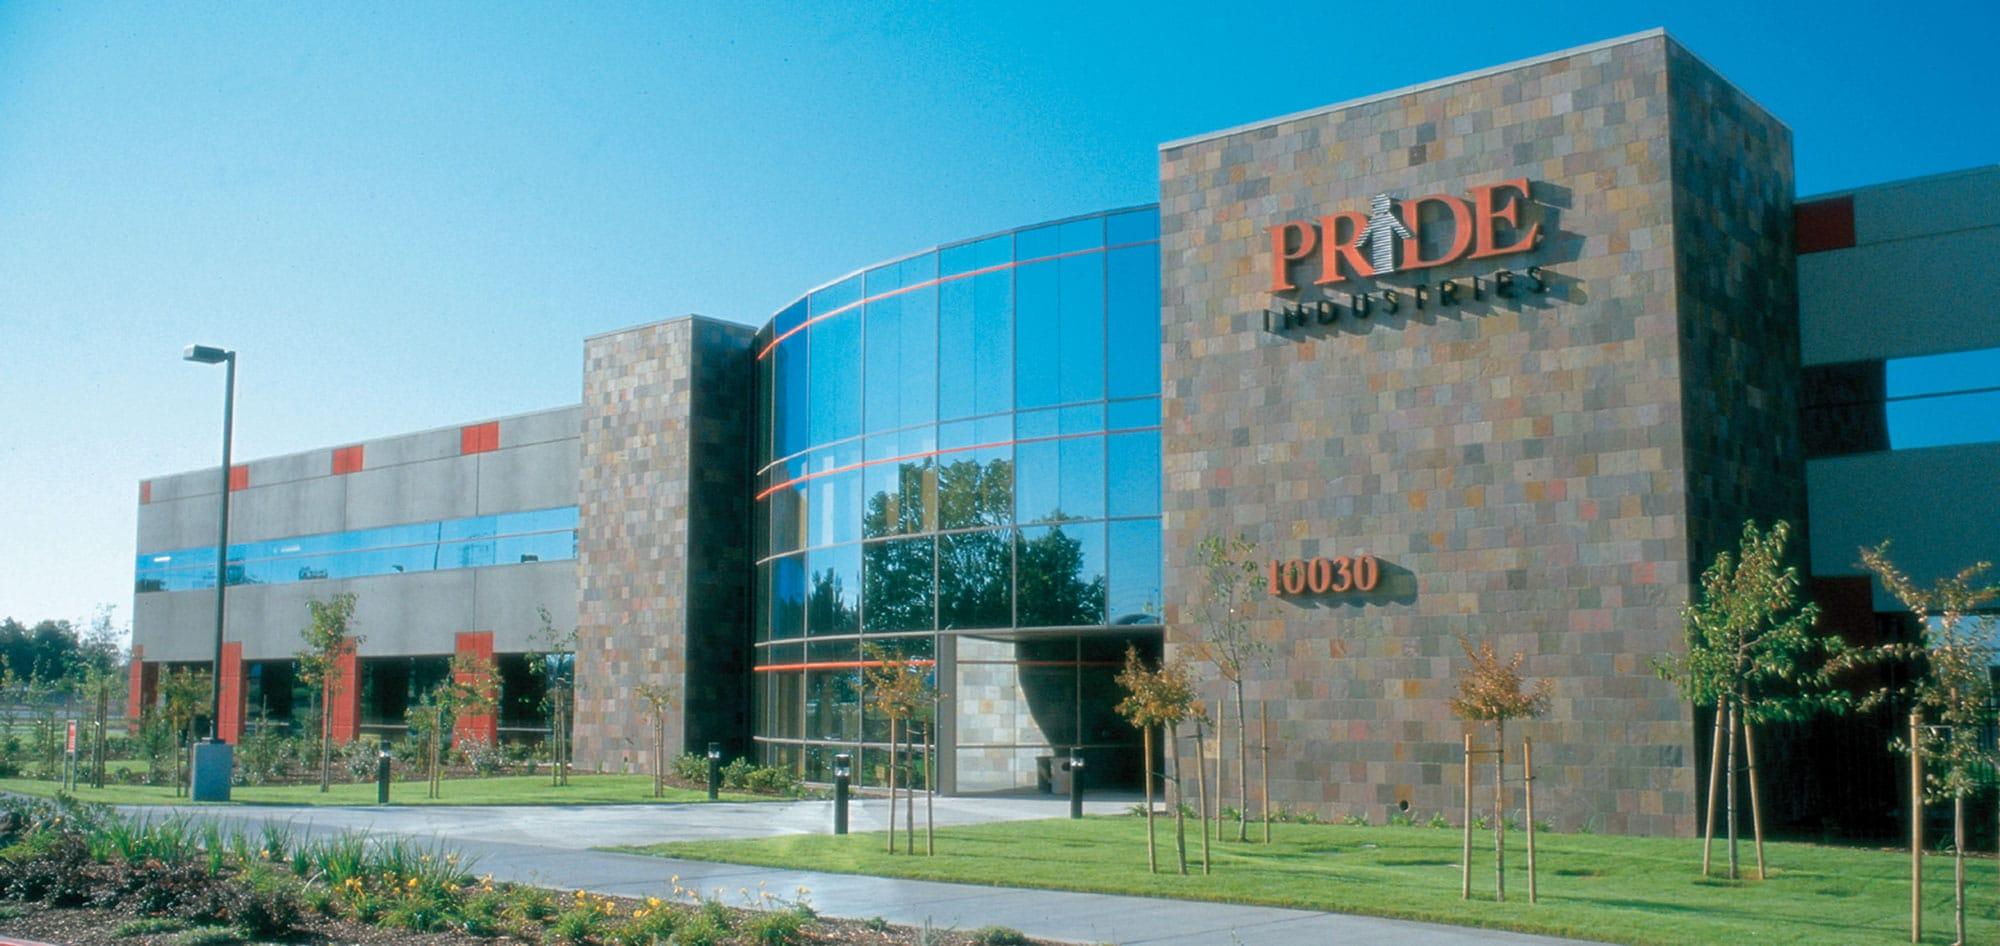 Image of PRIDE Industries headquarters